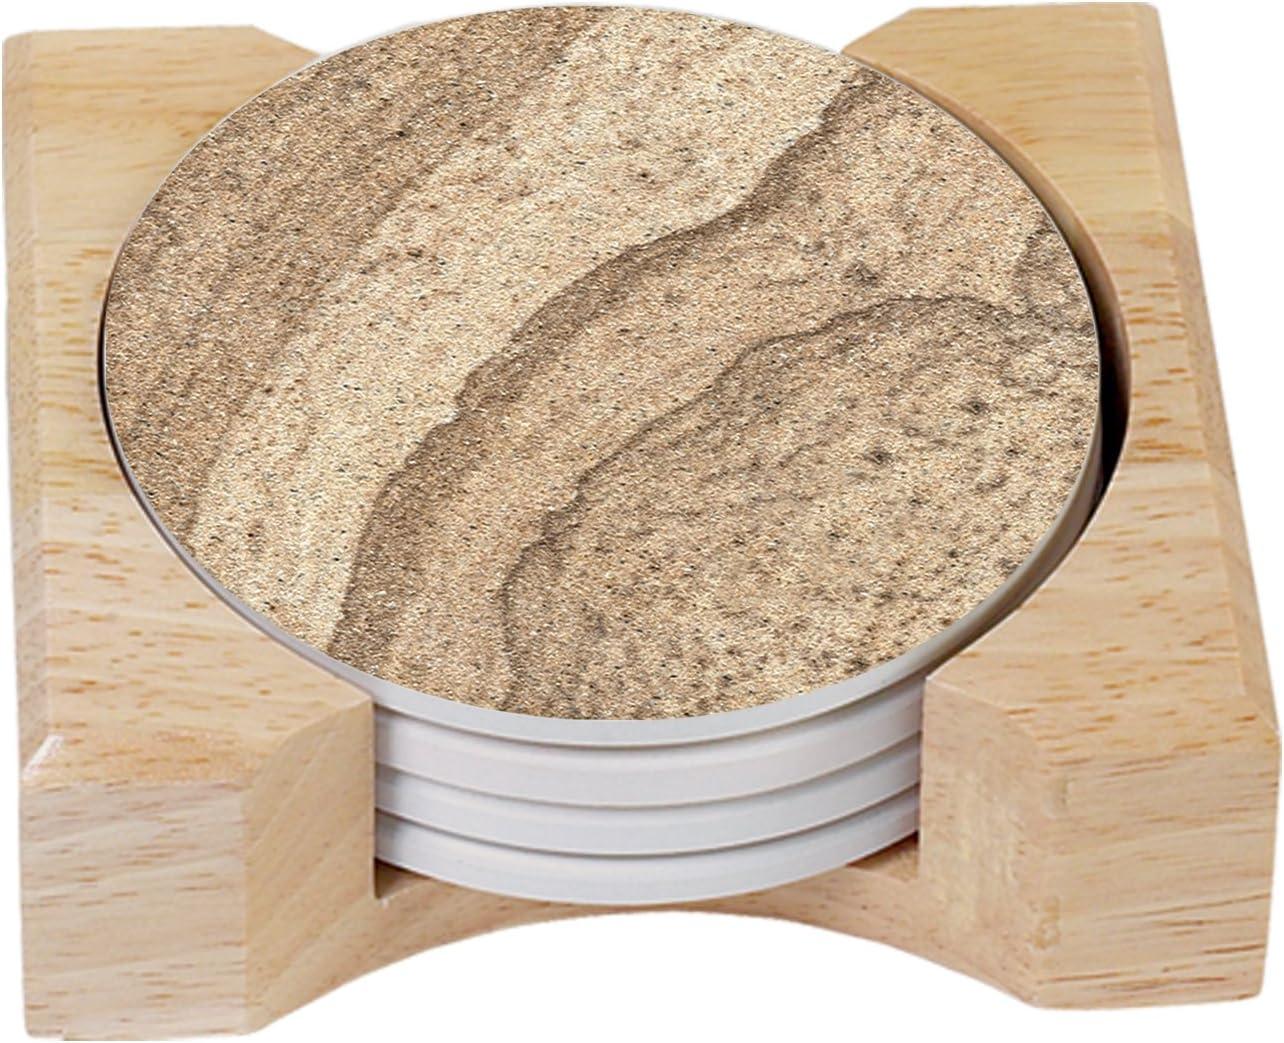 Counterart Absorbent Round Stone Coaster Set With Wooden Holder Sandstone Look Home Kitchen